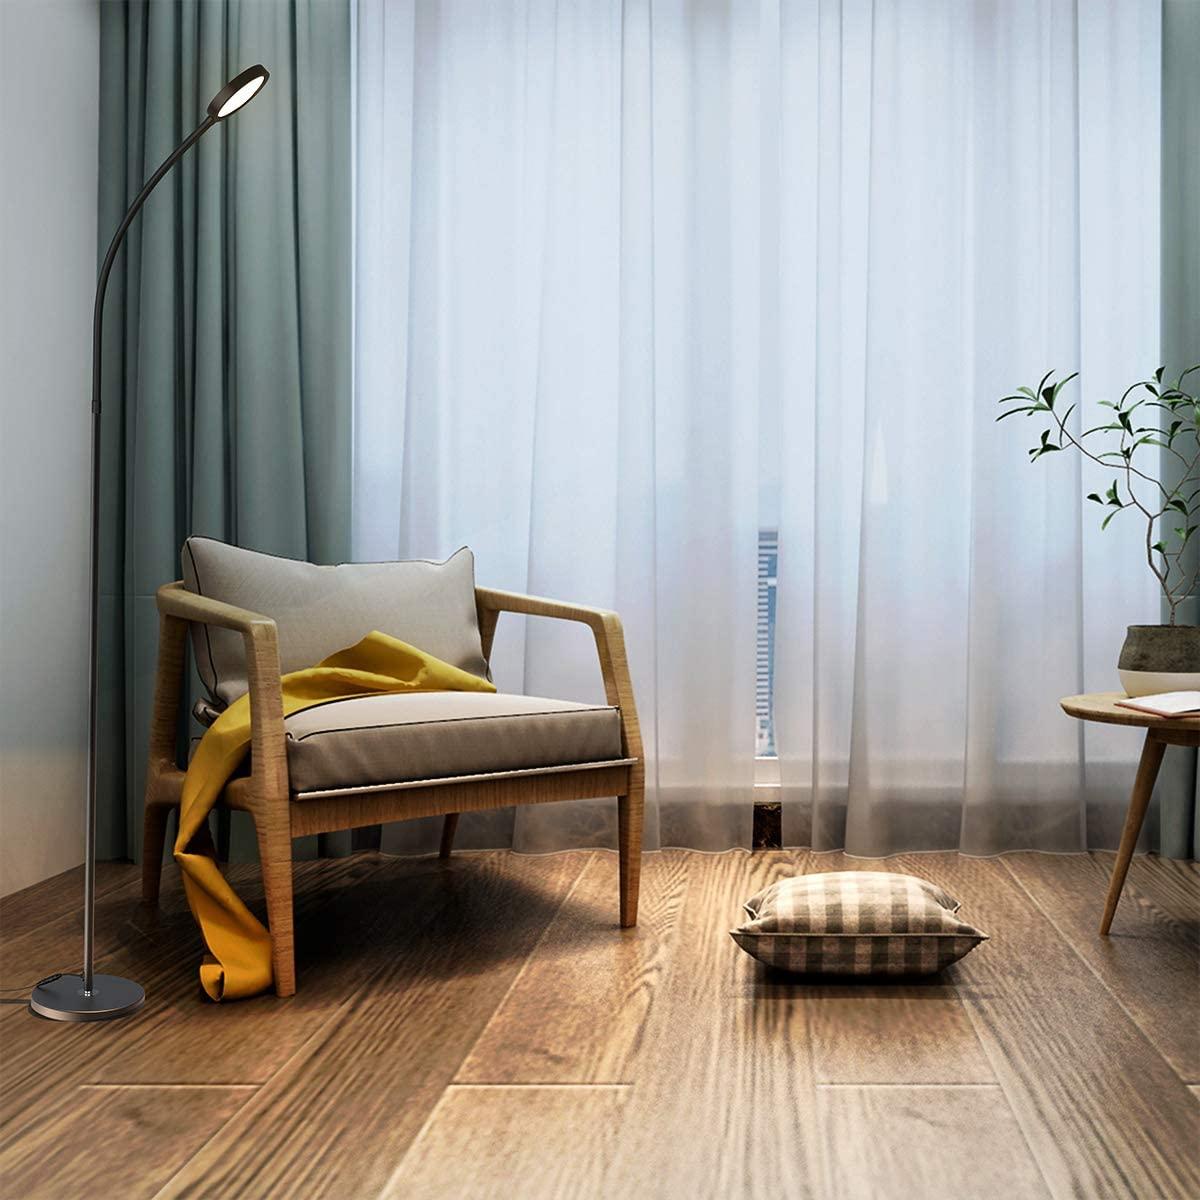 Dodocool-Floor-Lamp-Remote-Touch-Control. 10 Unique Floor Lamps to Brighten Your Living Room